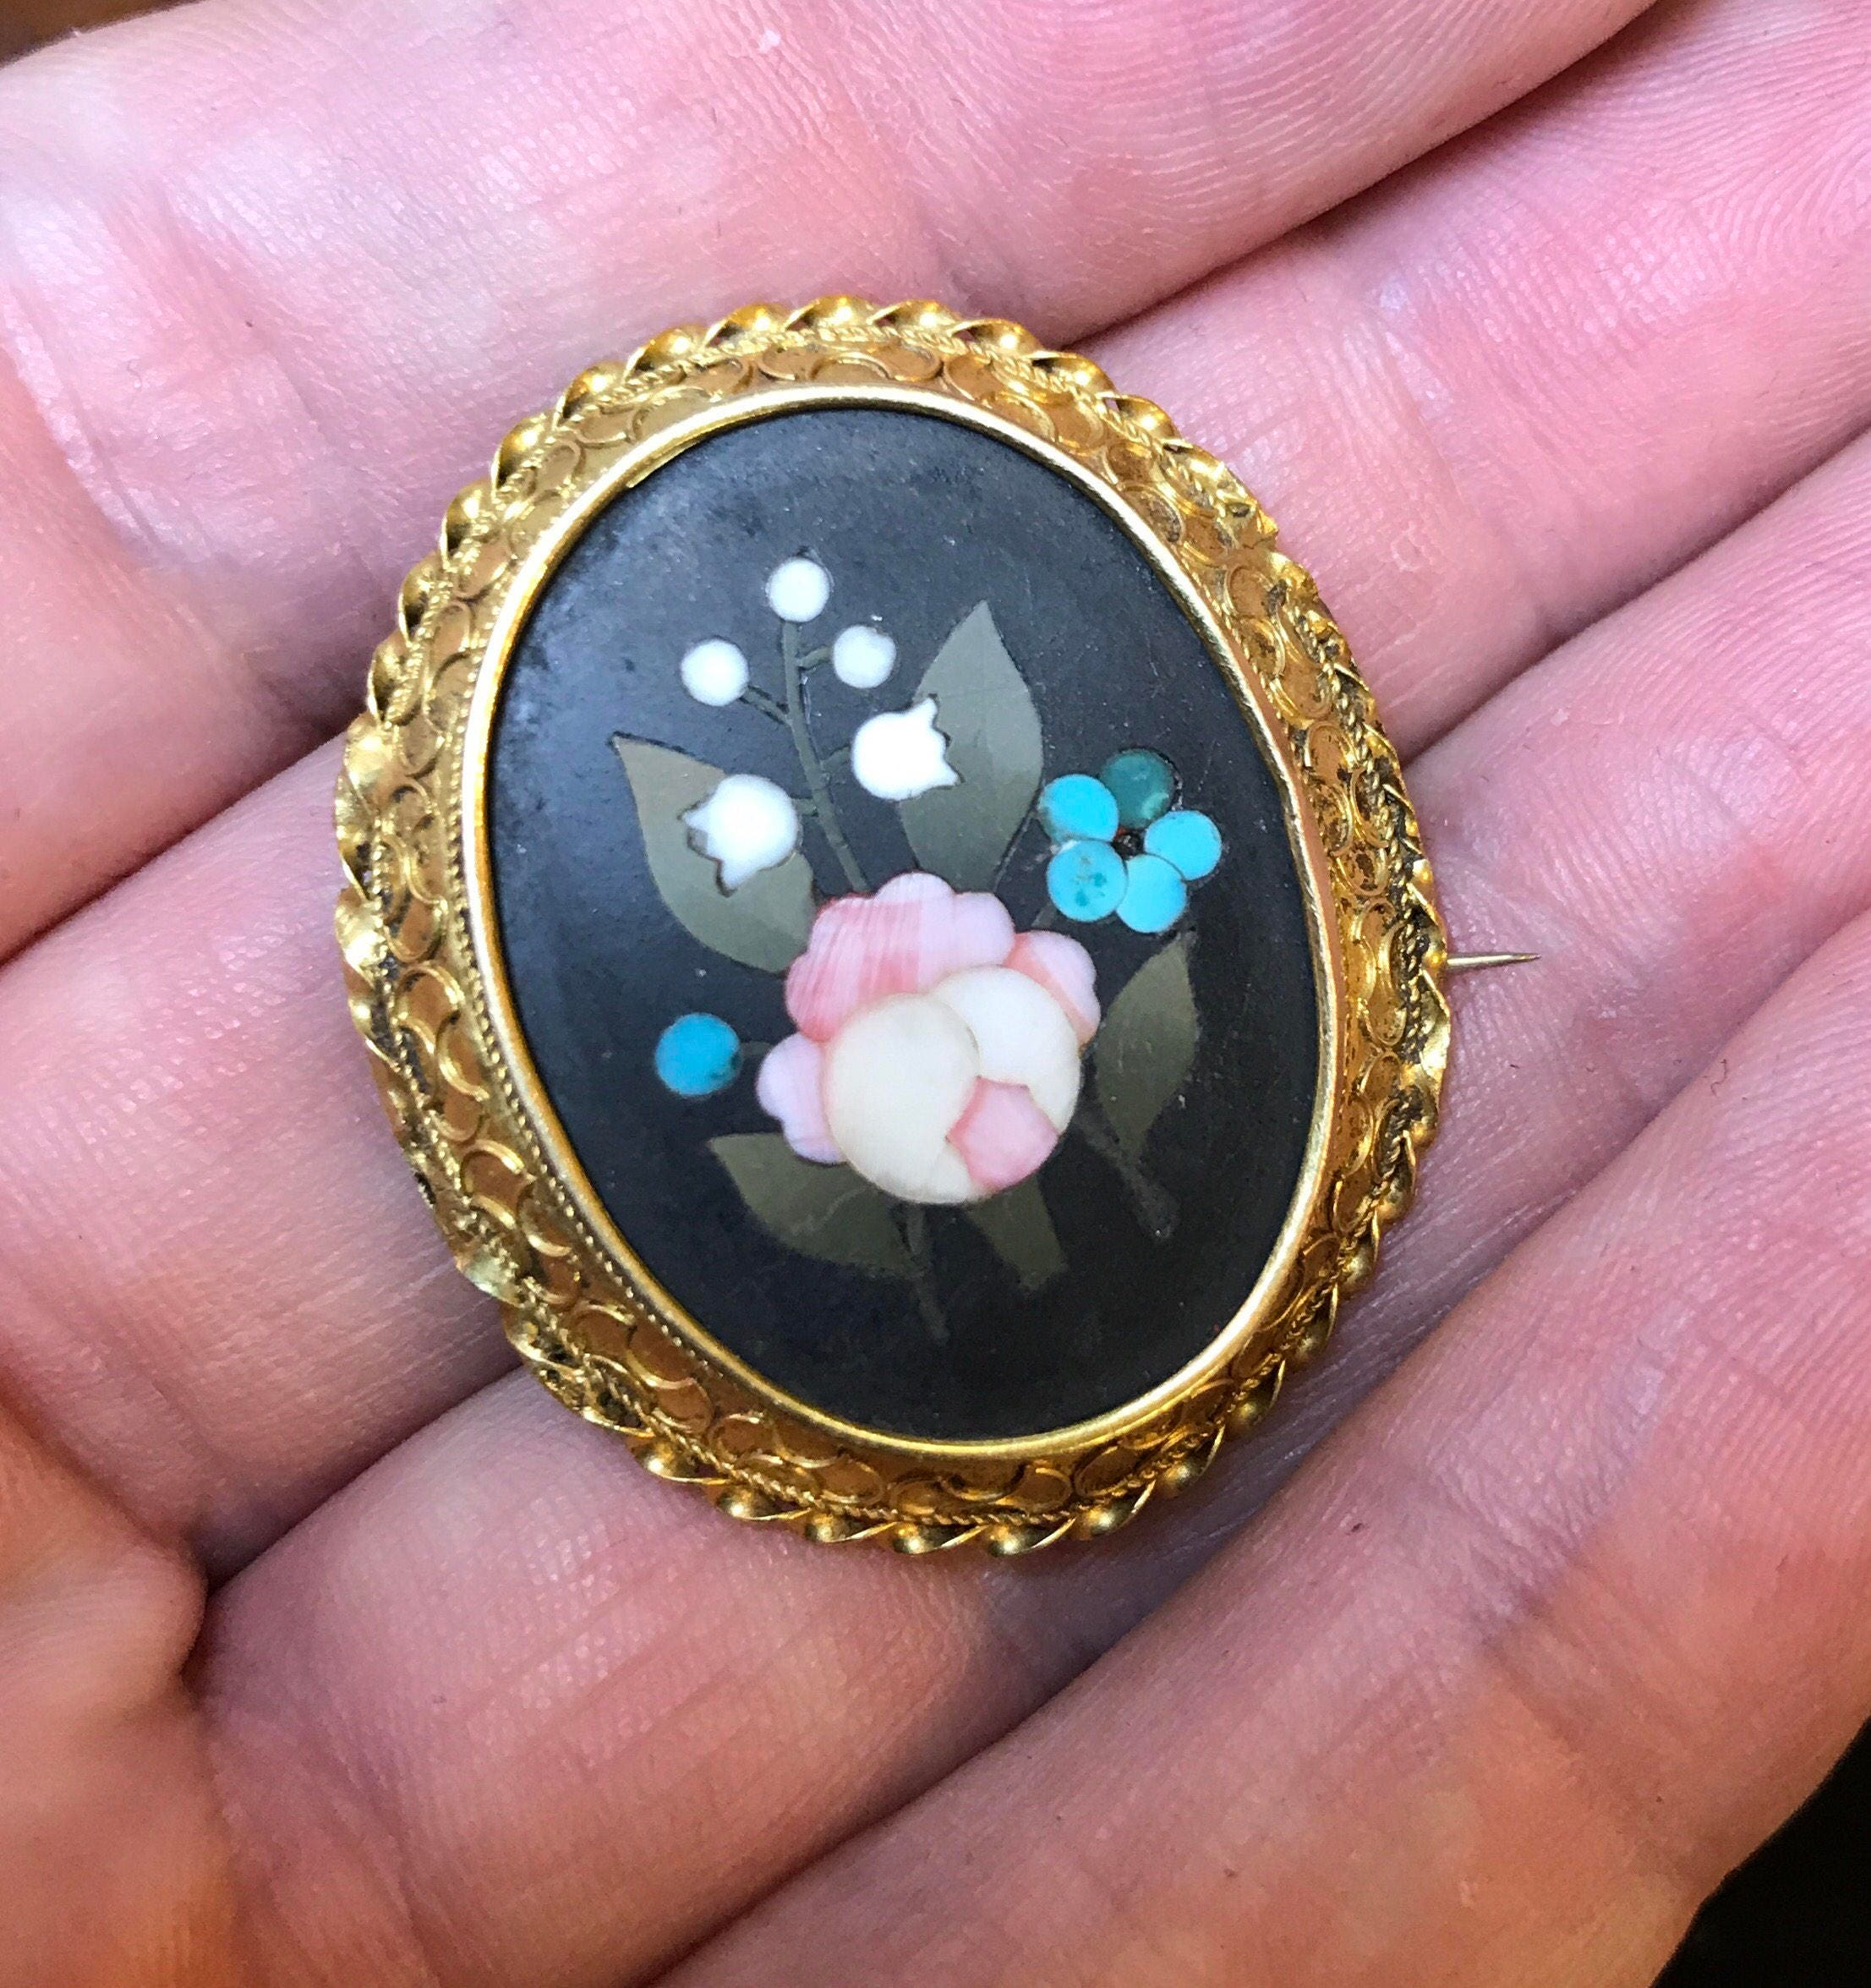 Antique Victorian 15k carat pietra dura hardstone flower brooch pin Italian Florentine Grand Tour